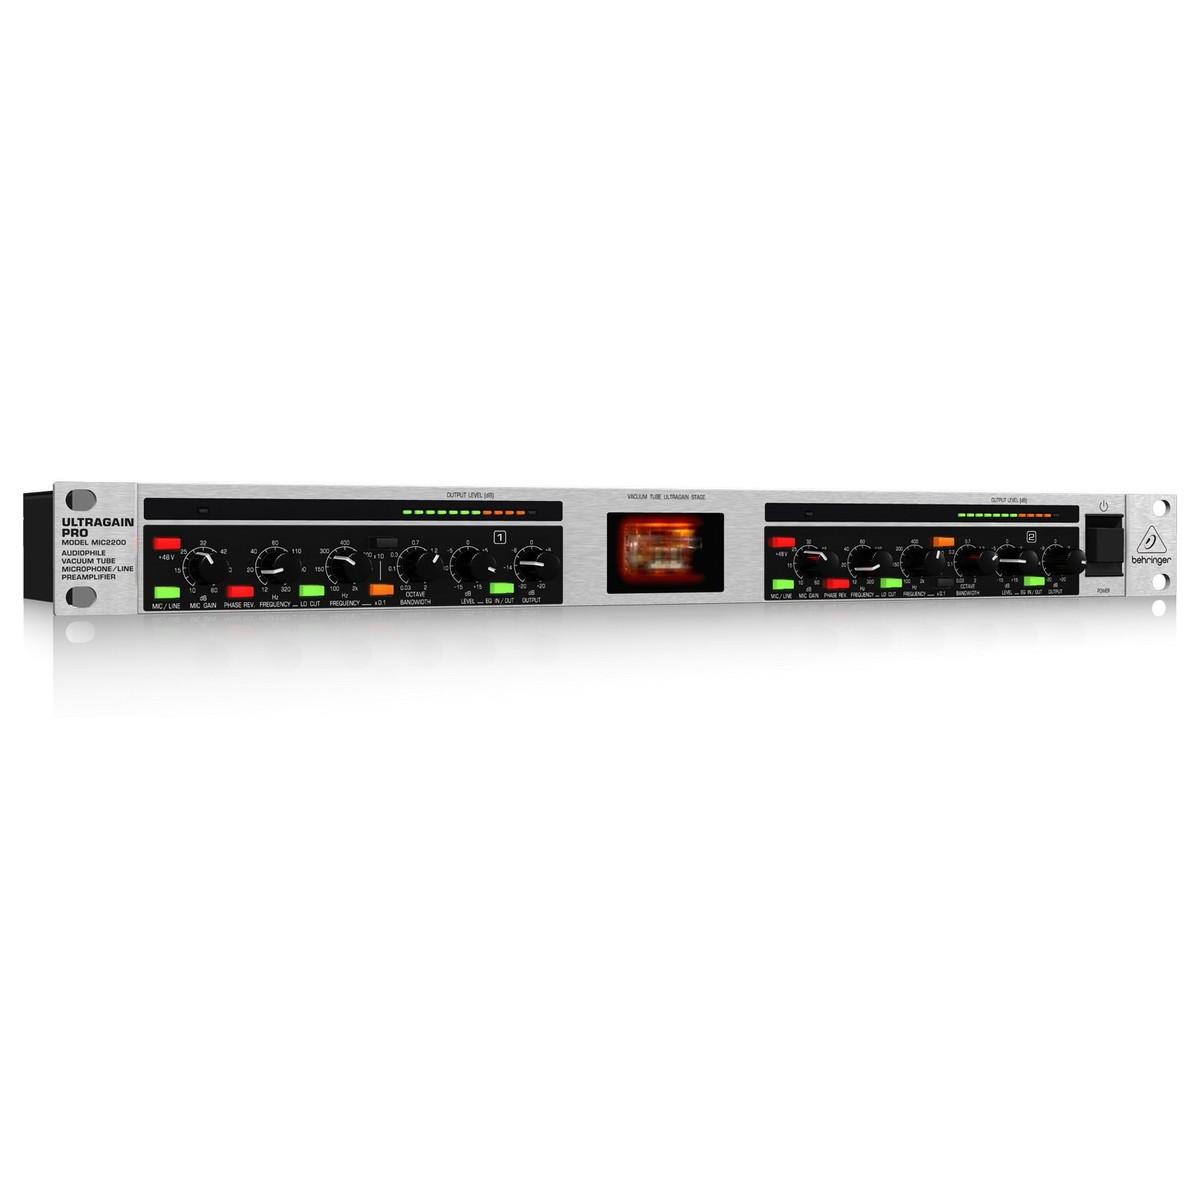 Image of Behringer MIC2200 Ultragain Pro Mic Preamplifier